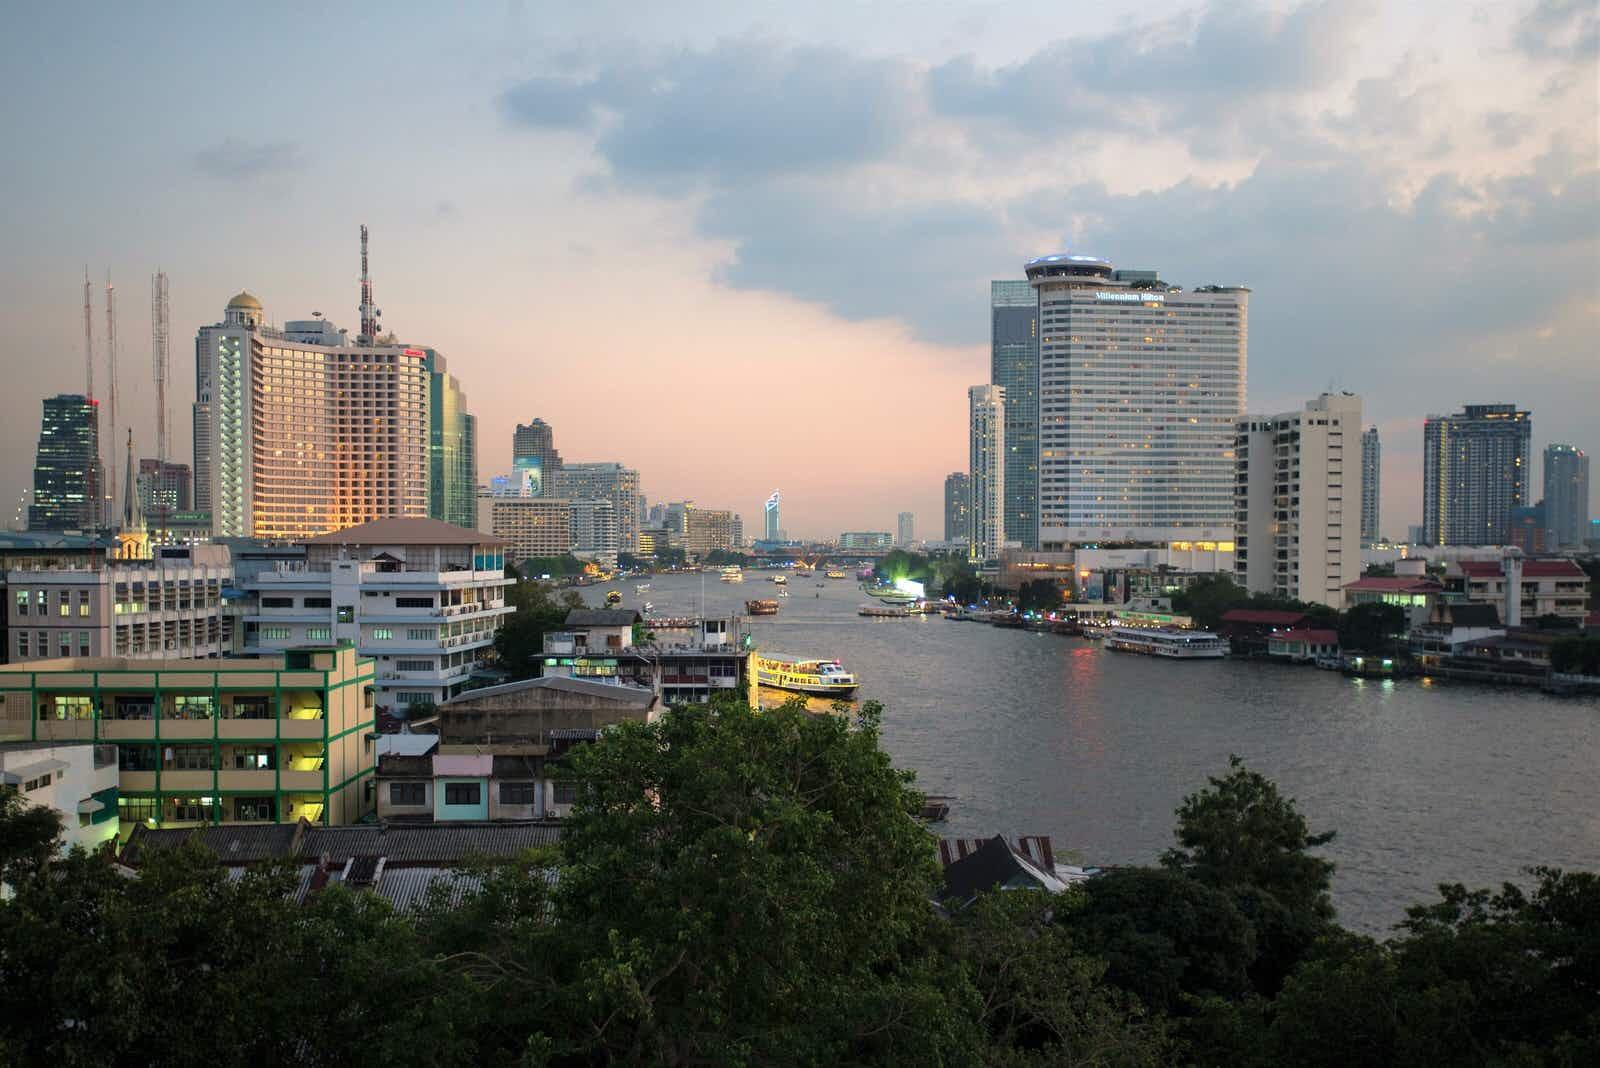 Bangkok's best views: top spots to admire the Thai capital